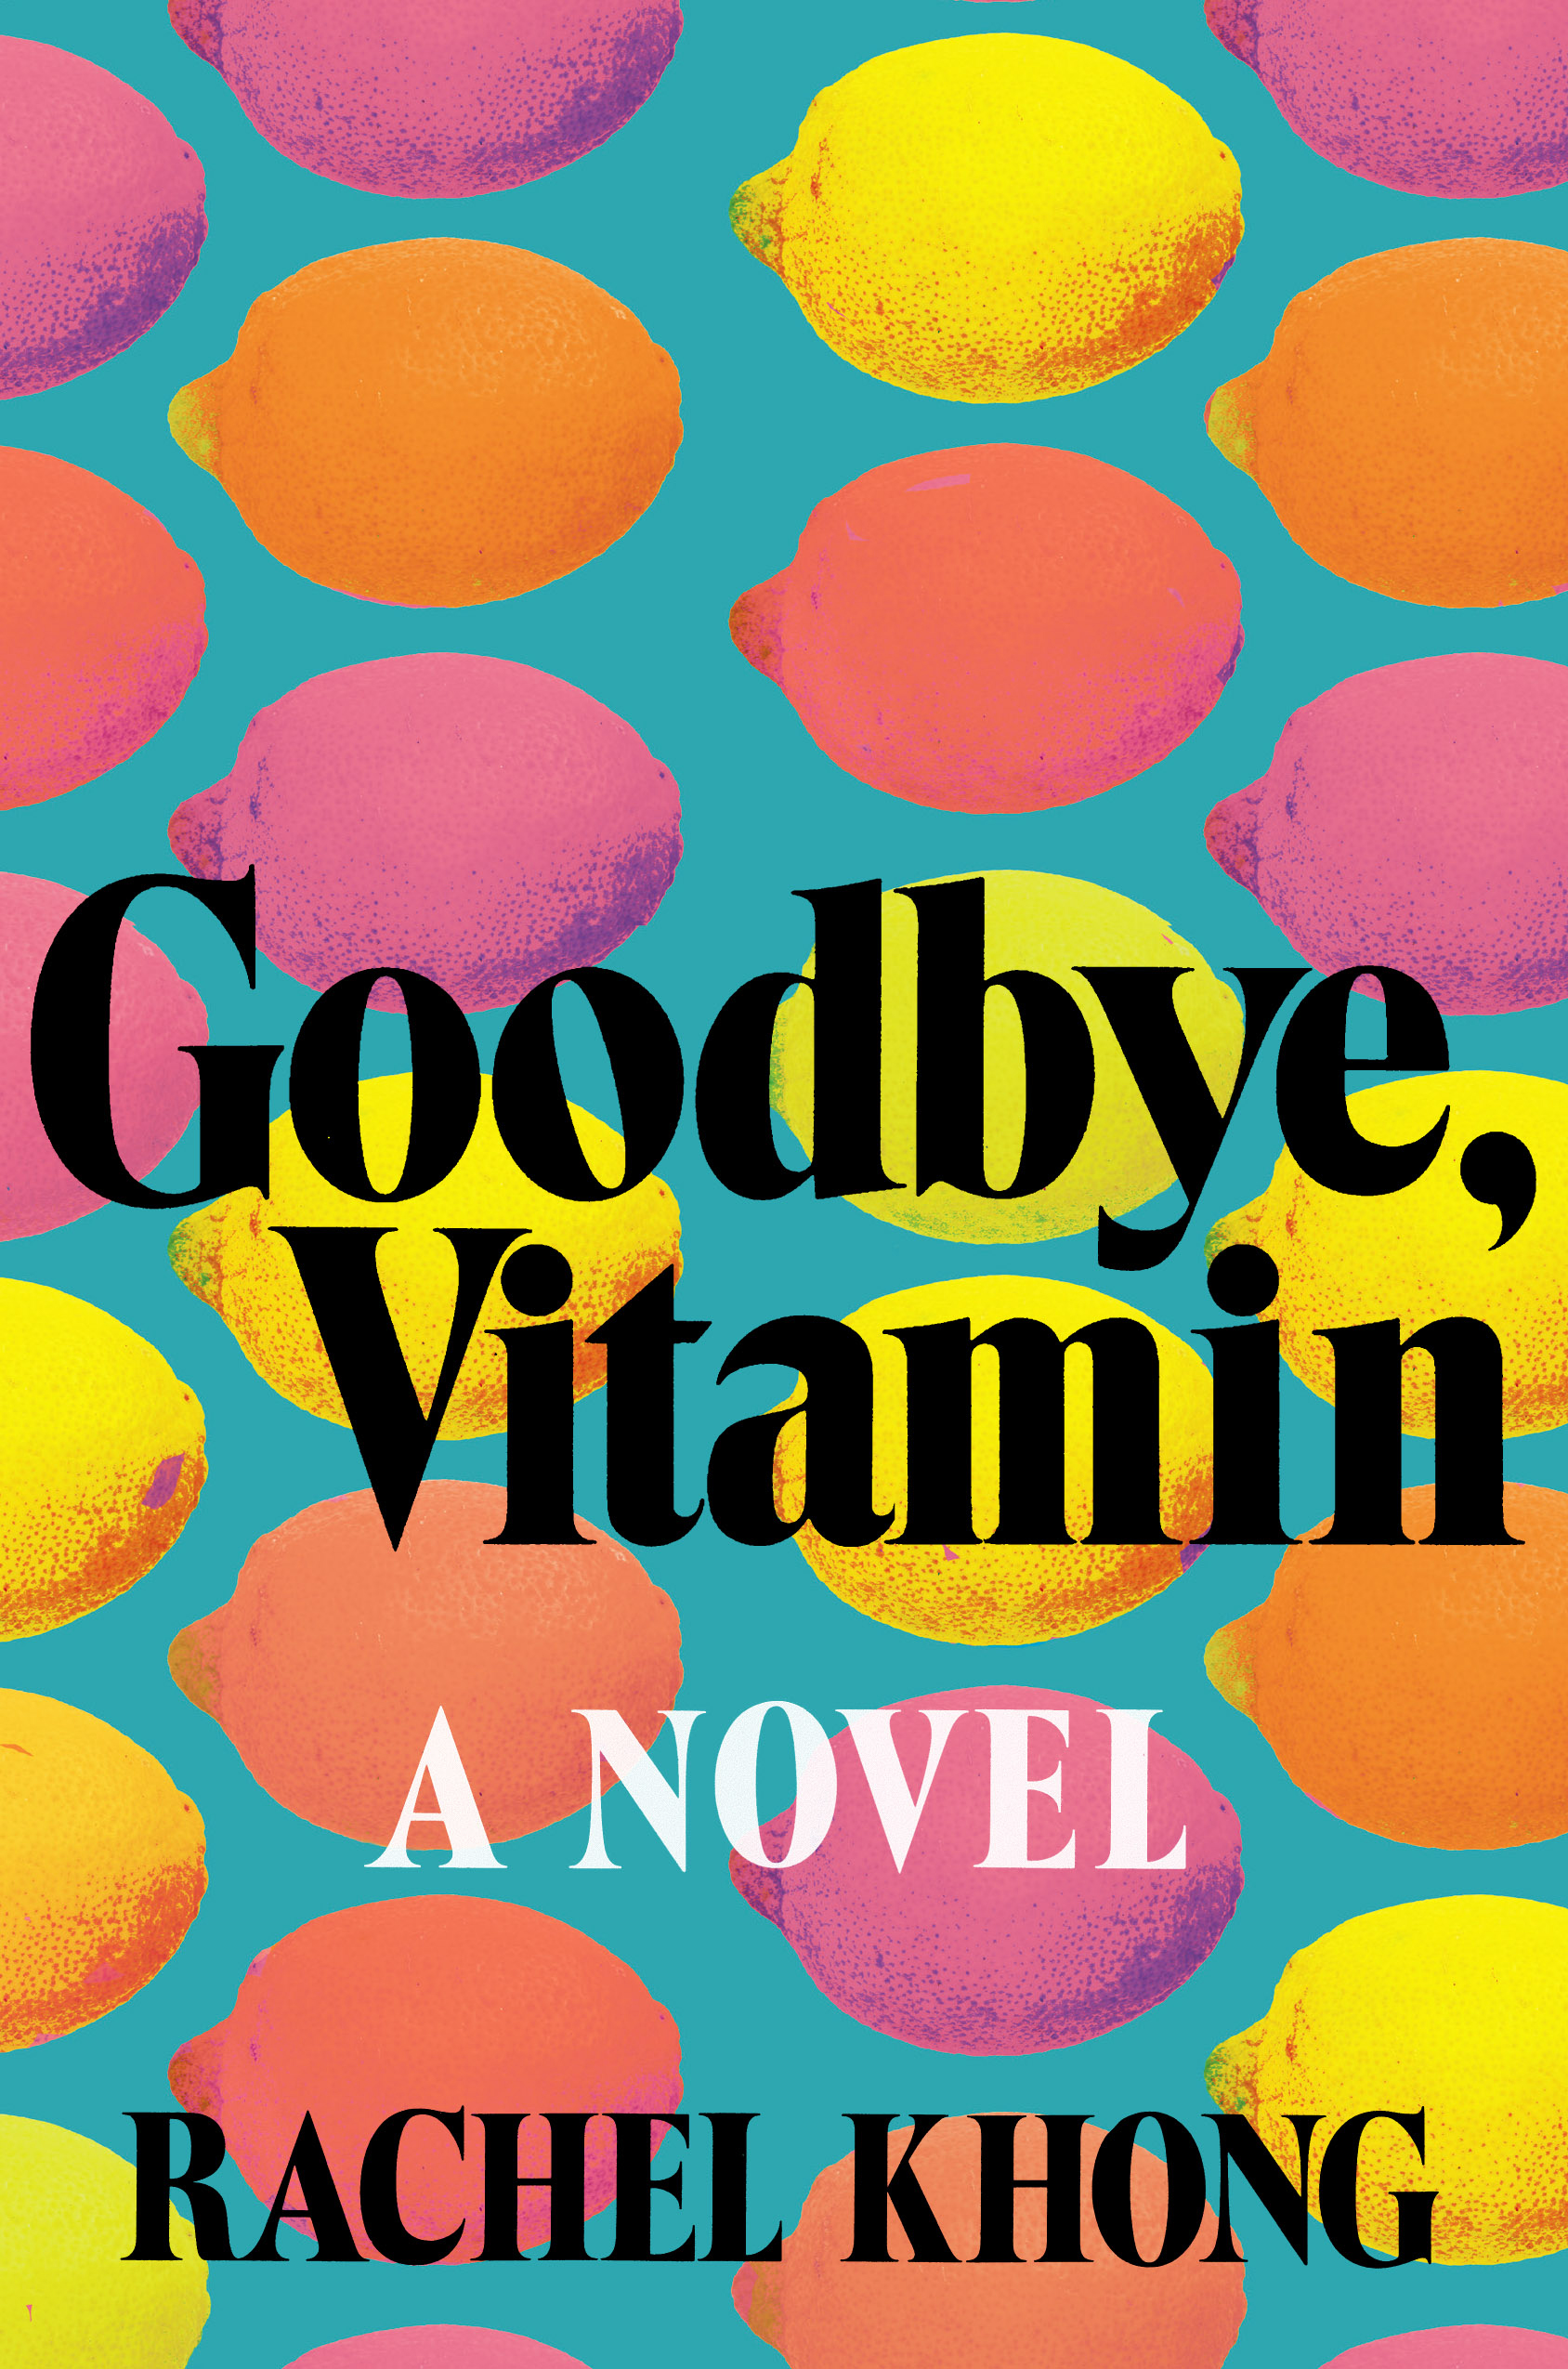 10 Books to Read this Summer | Blog | Raincoast Books